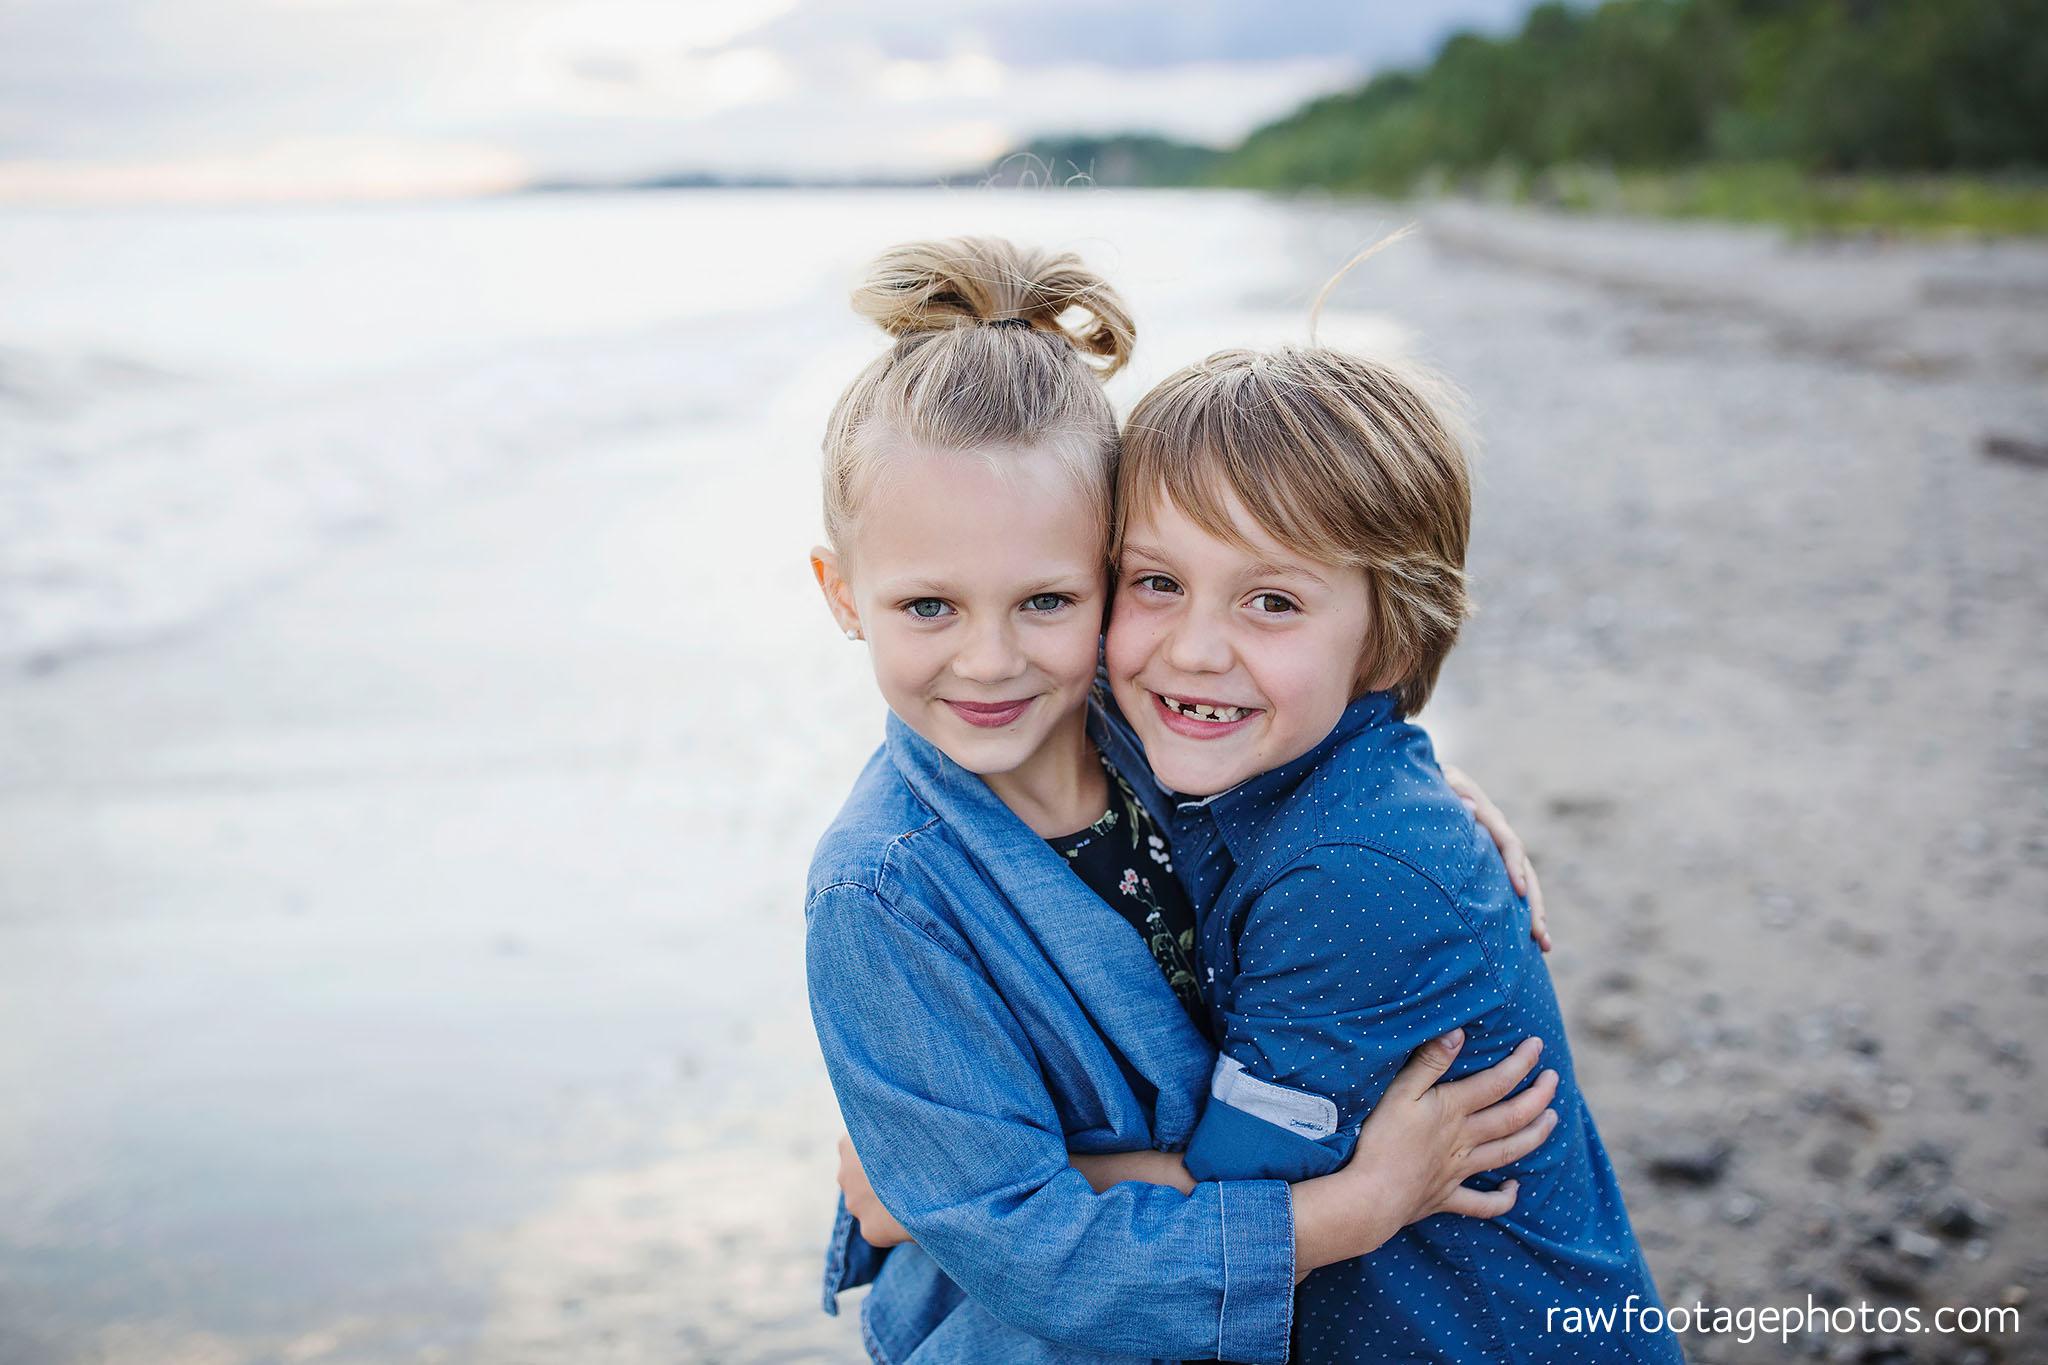 london_ontario_photographer-raw_footage_photography-beach_minis-port_stanley_beach-family_photographer-couple_photographer-lifestyle_photographer063.jpg